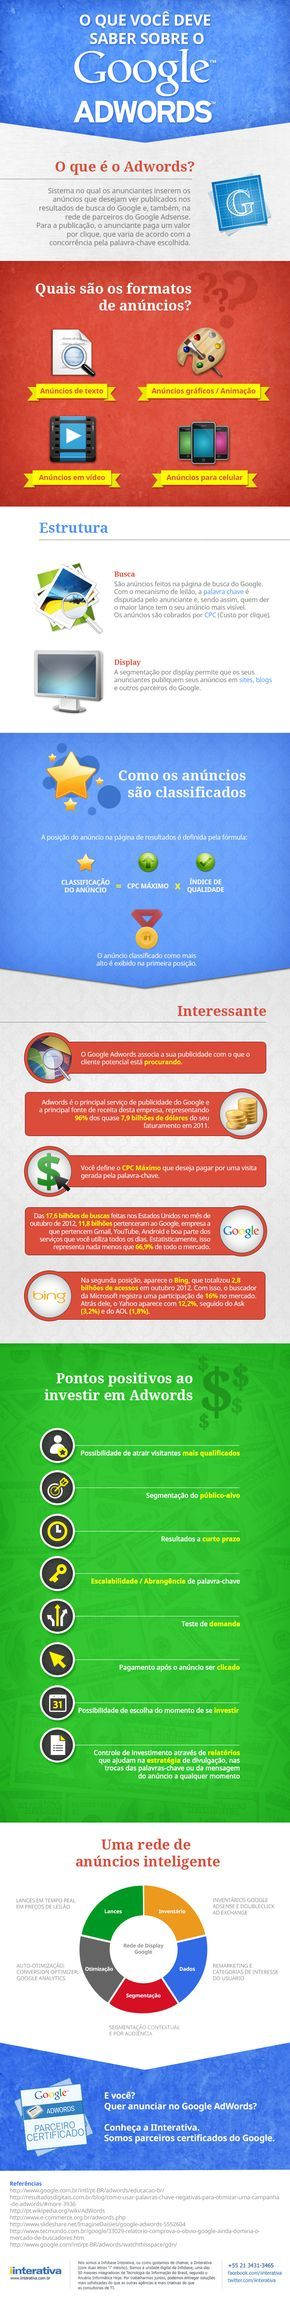 Descubra como funciona o Google Adwords. #SocialMedia #Adwords #infographic                                                                                                                                                     Mais